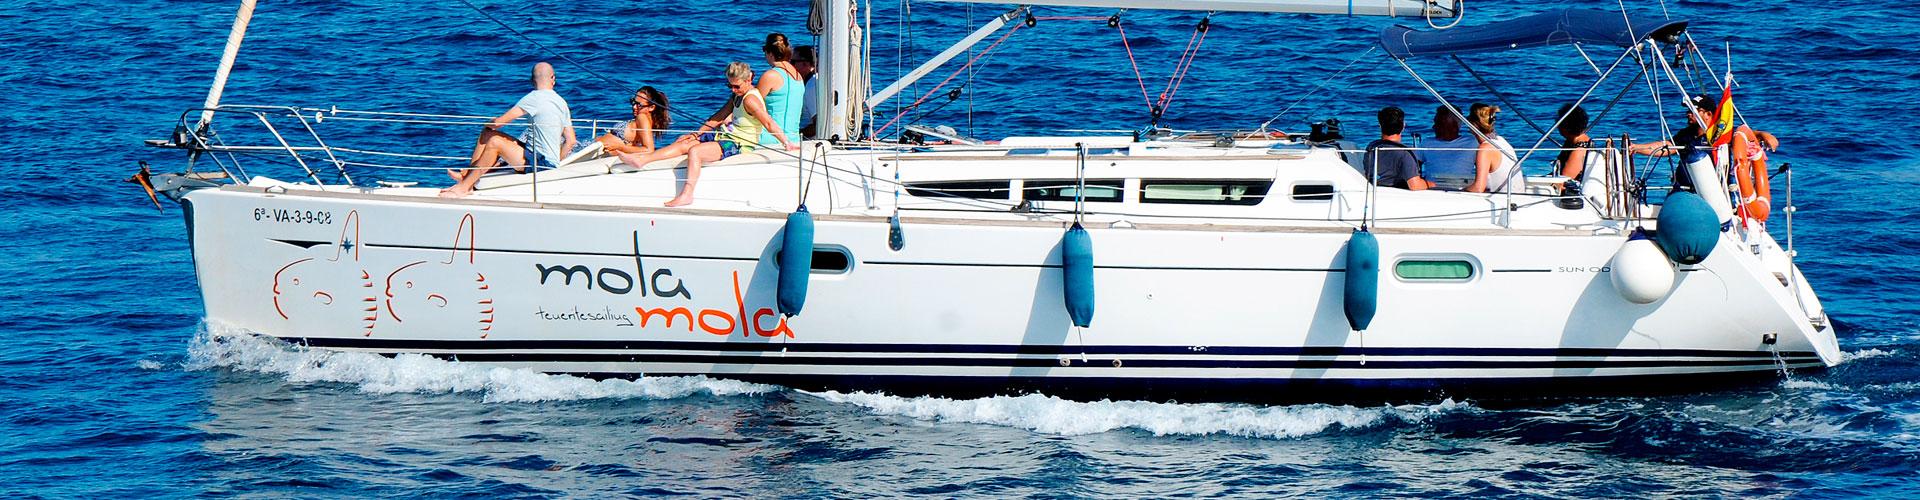 Segelschiff Mola Mola